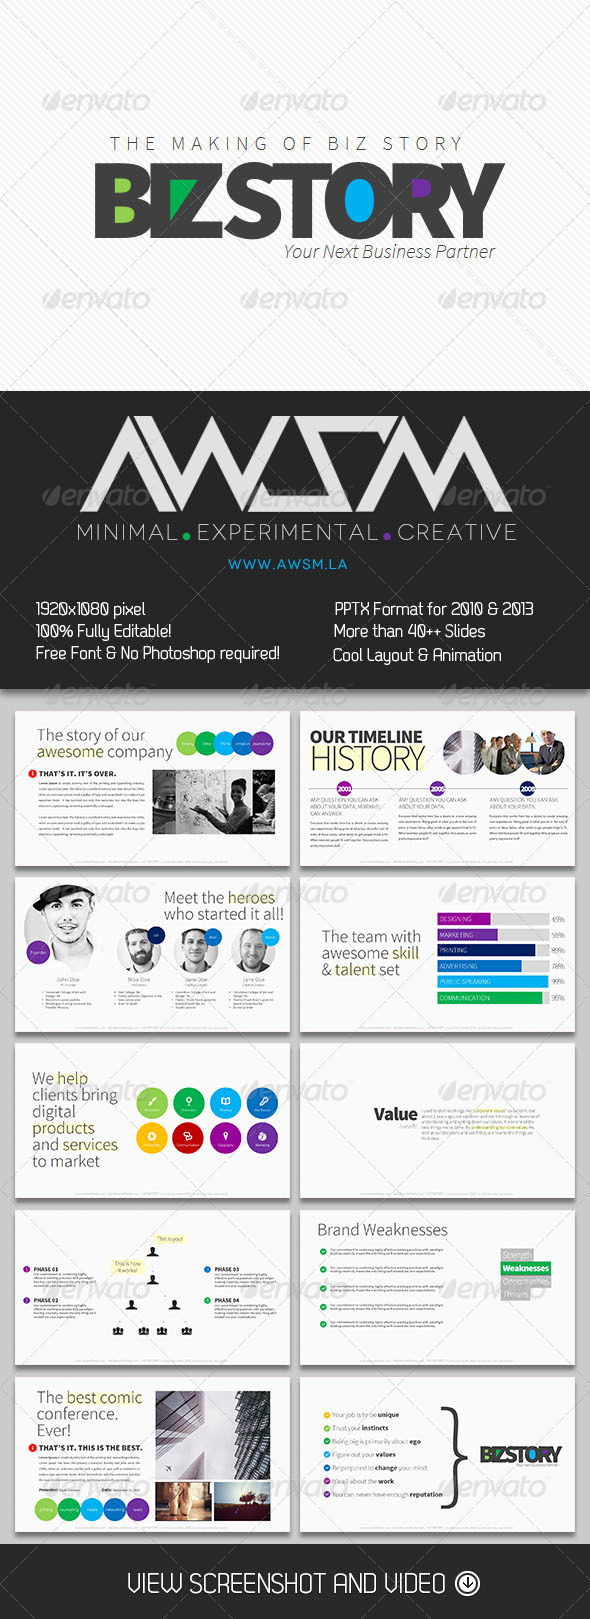 GraphicRiver Minimalist Biz Story PowerPoint Presentation 5997520